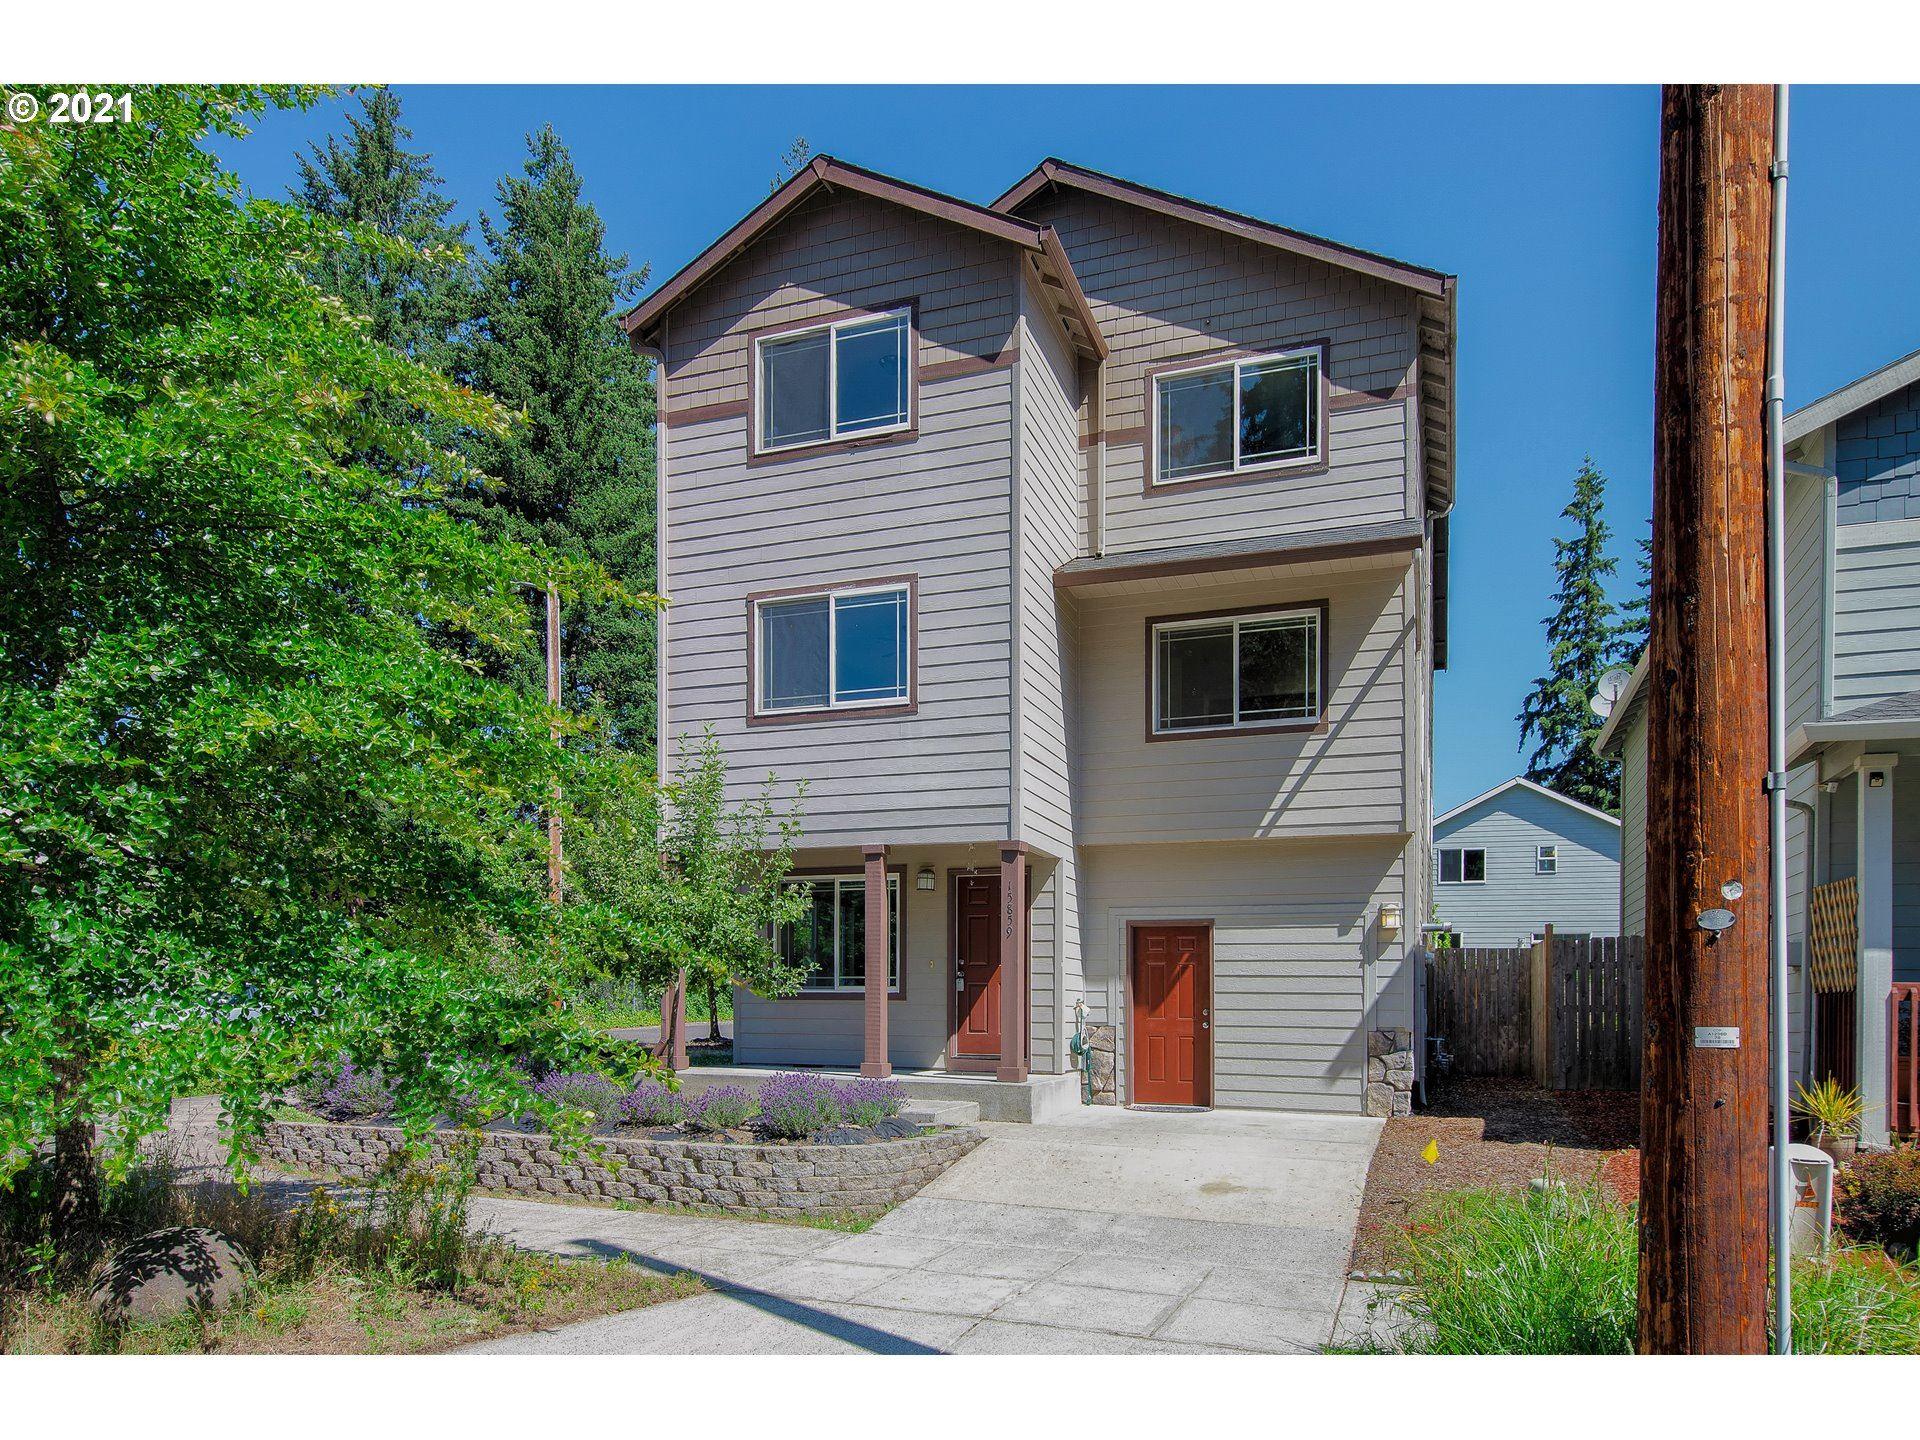 15859 NE DAVIS ST, Portland, OR 97230 - MLS#: 21144674